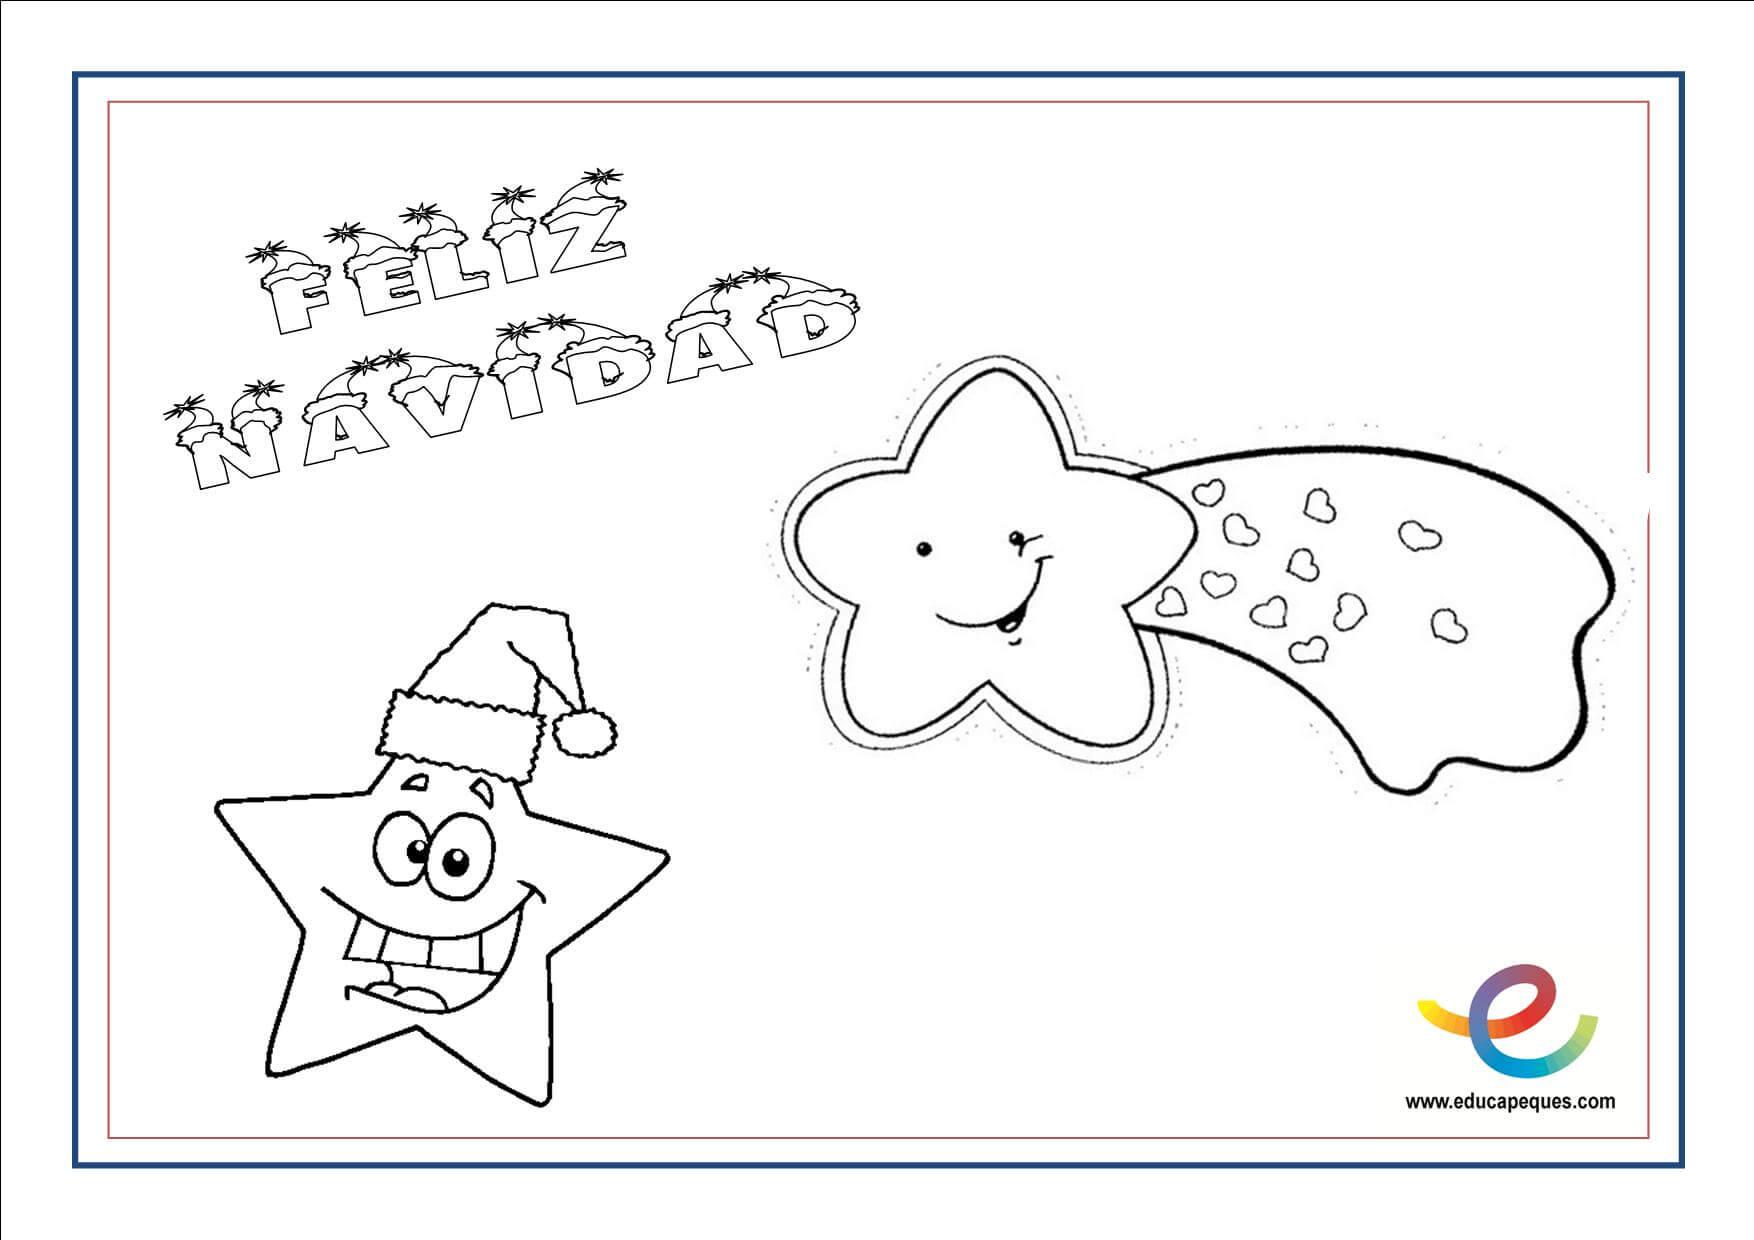 Dibujos Para Colorear Navidenos Imprimir: Dibujos Para Colorear De Navidad. Actividades Navideñas